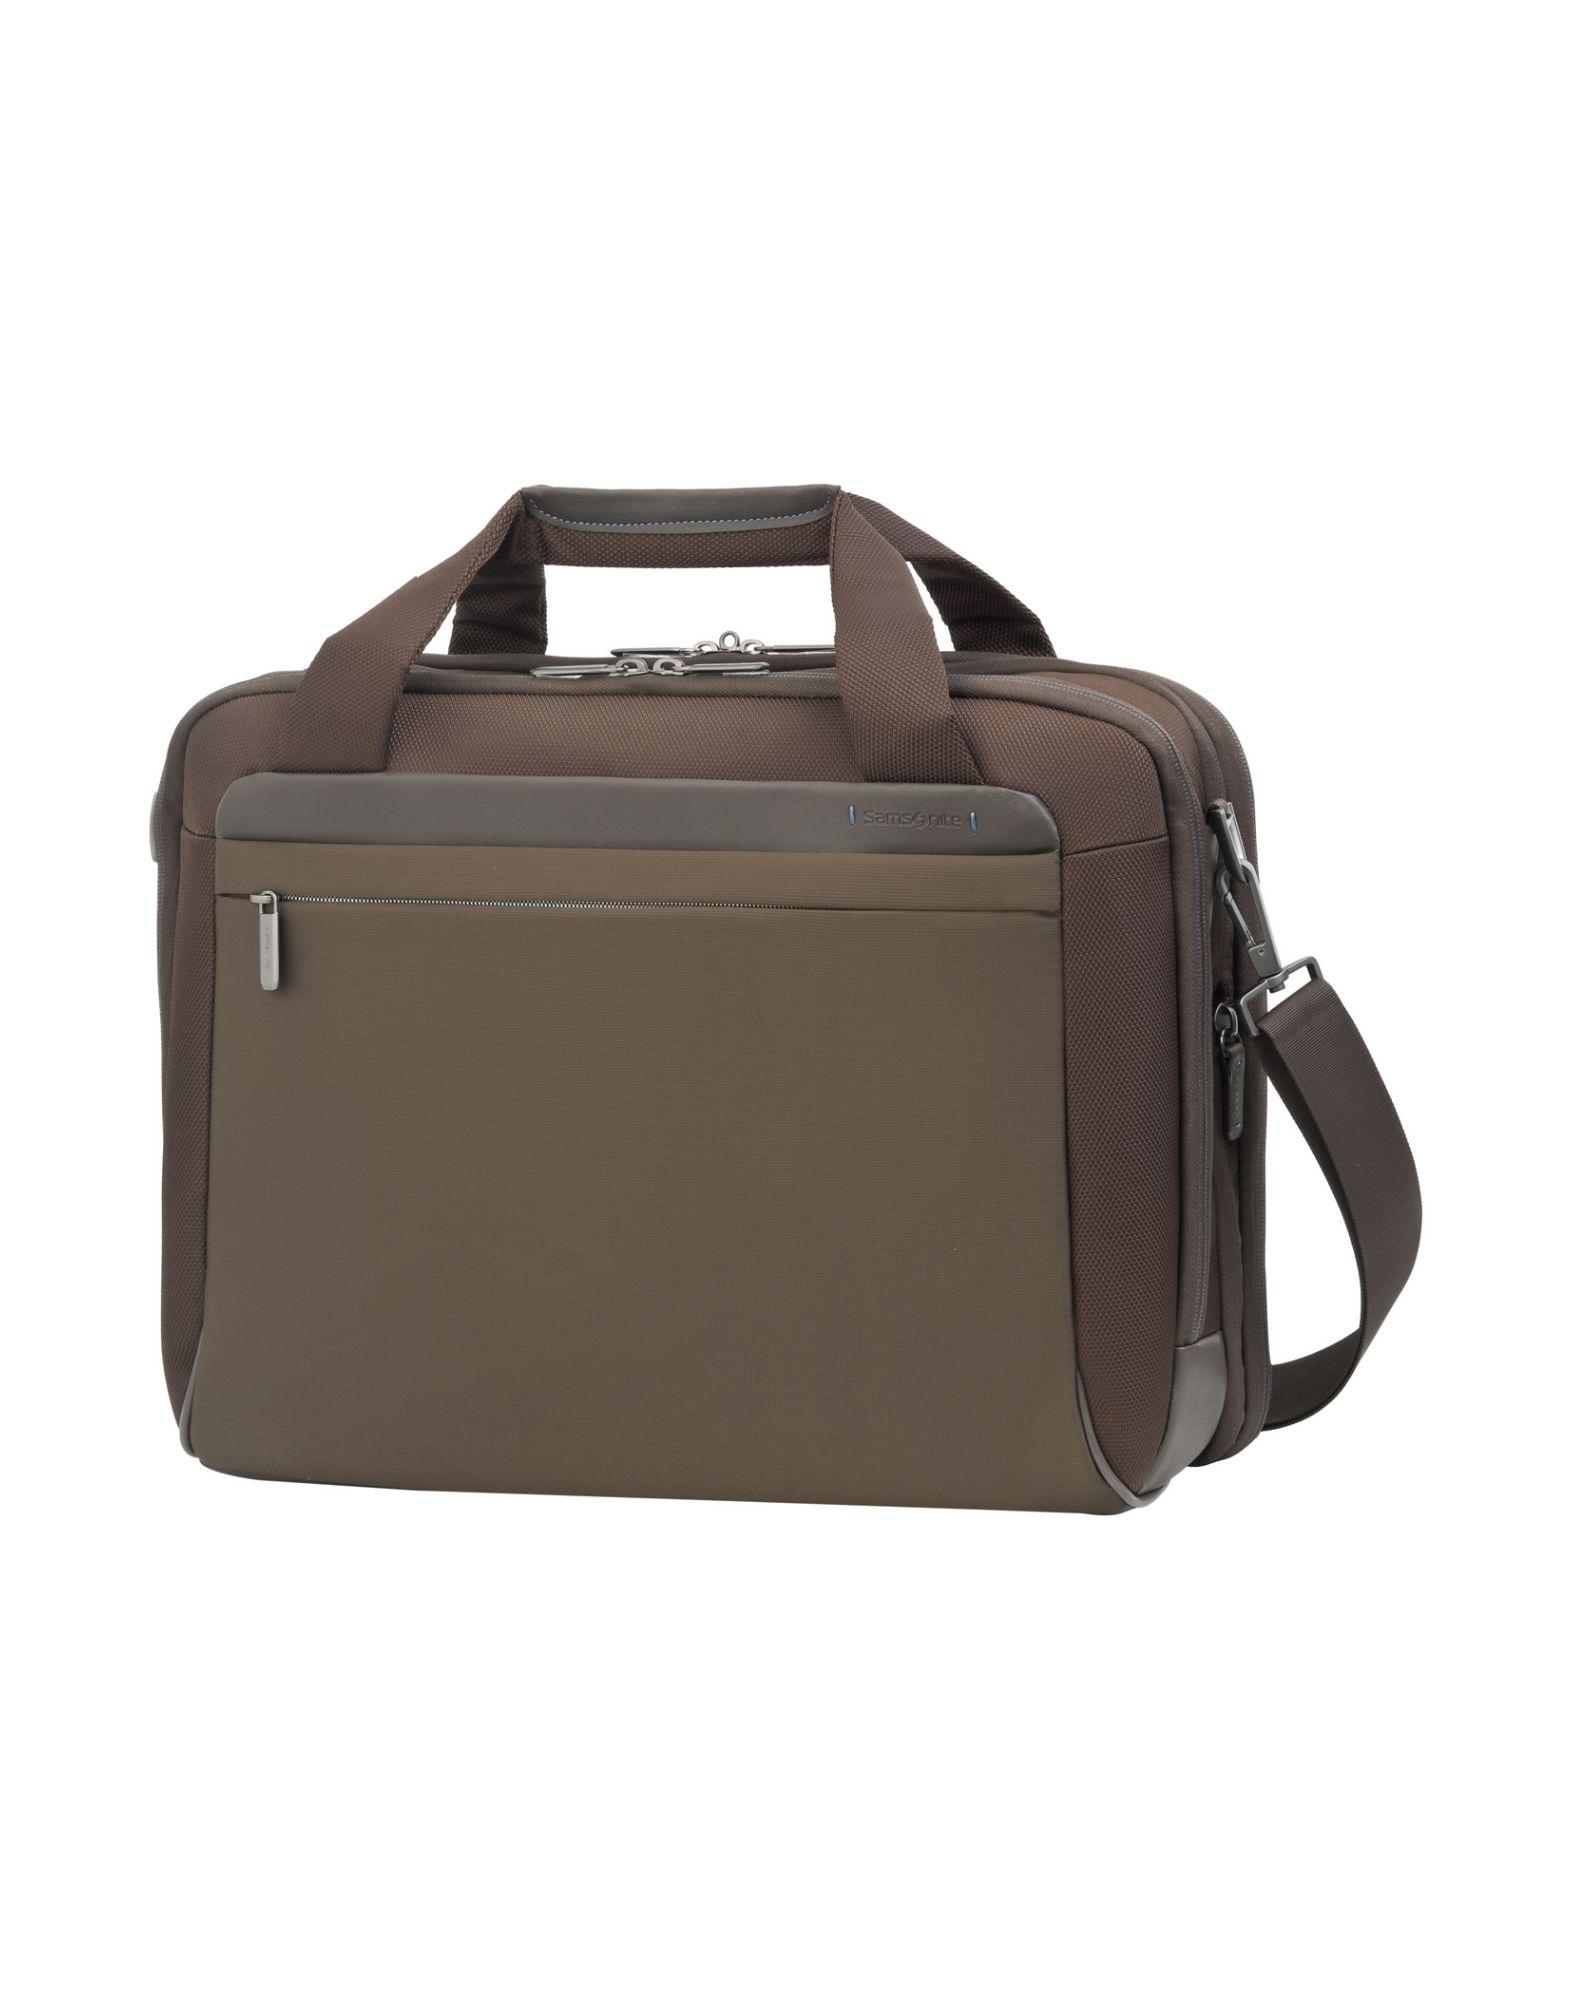 Samsonite Spectrolite Laptop Bag in Brown